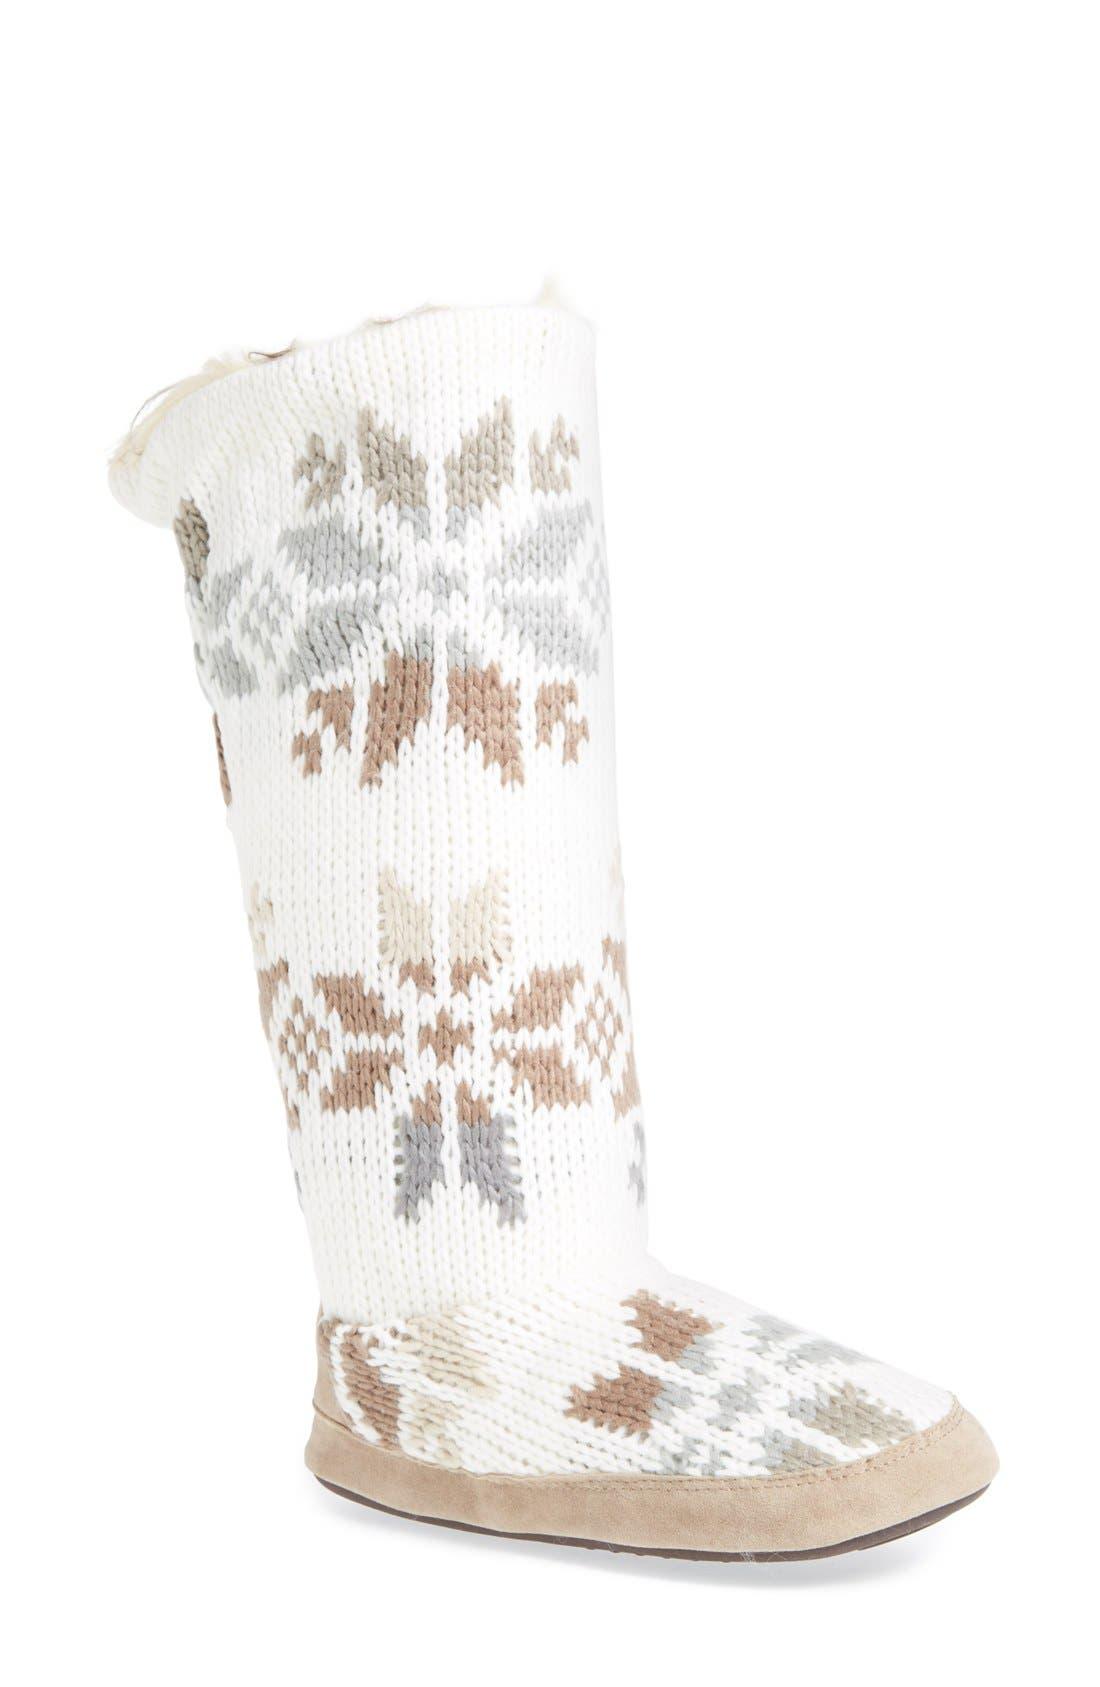 Alternate Image 1 Selected - MUK LUKS 'Maleah' Slipper Boot (Women)